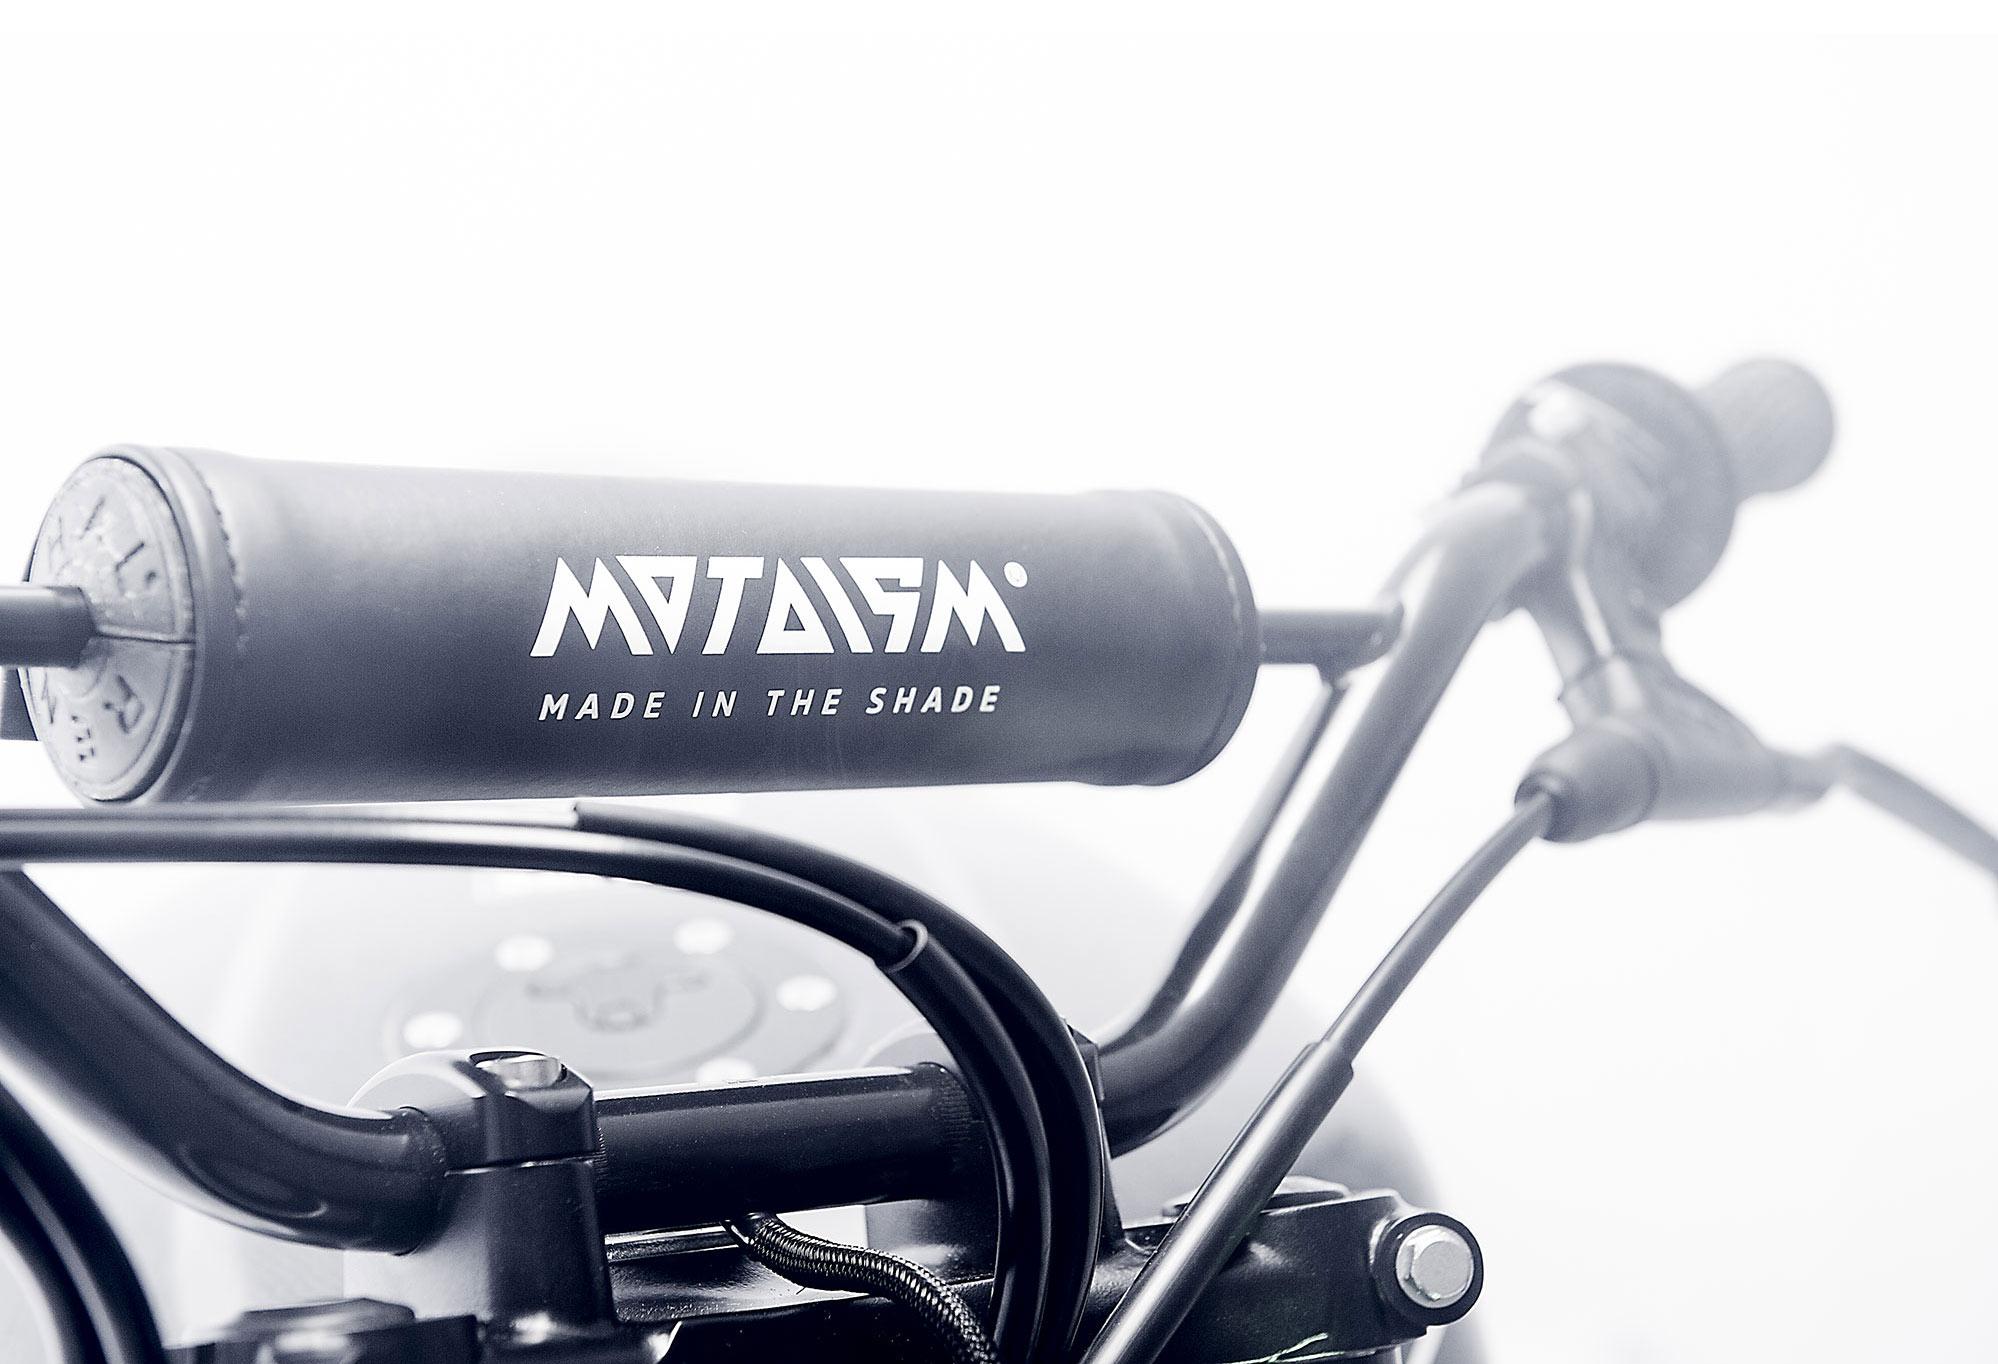 Motoism_Starrider_Studio_LudwigMaierPhotography2715